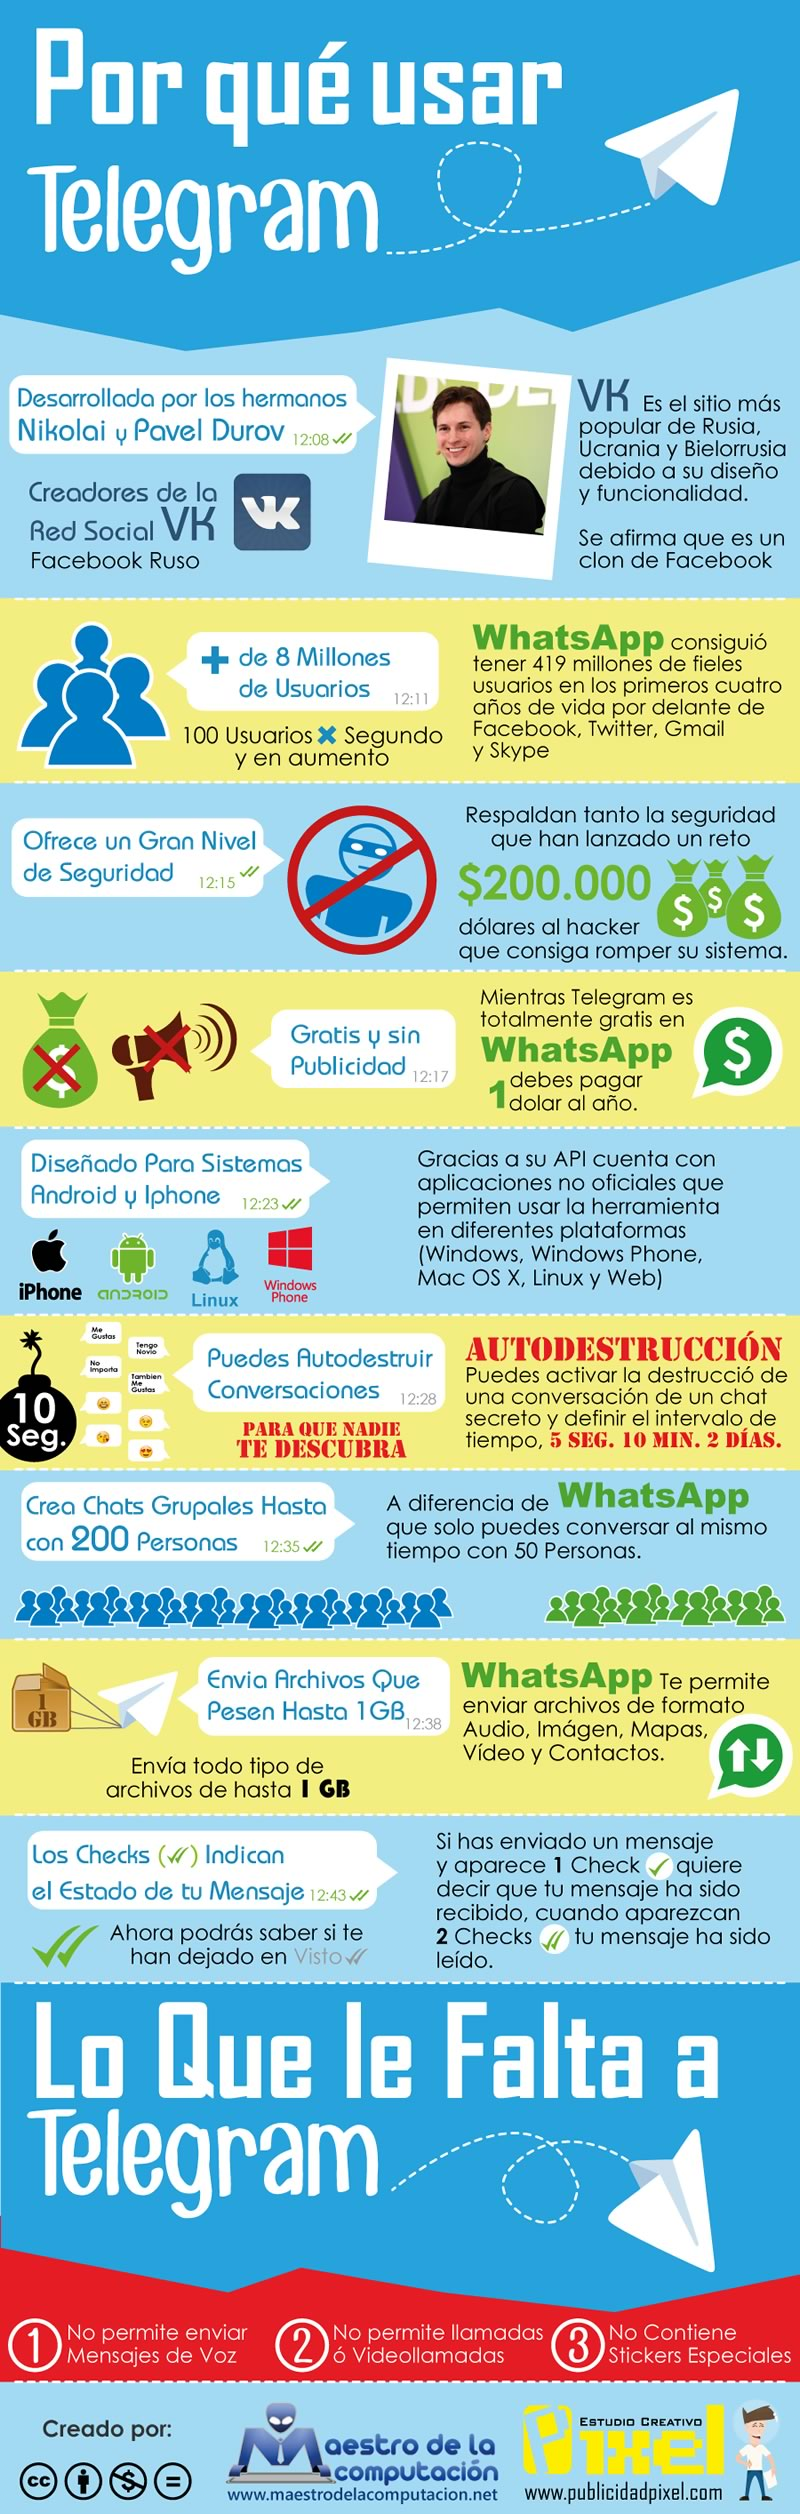 usar-telegram